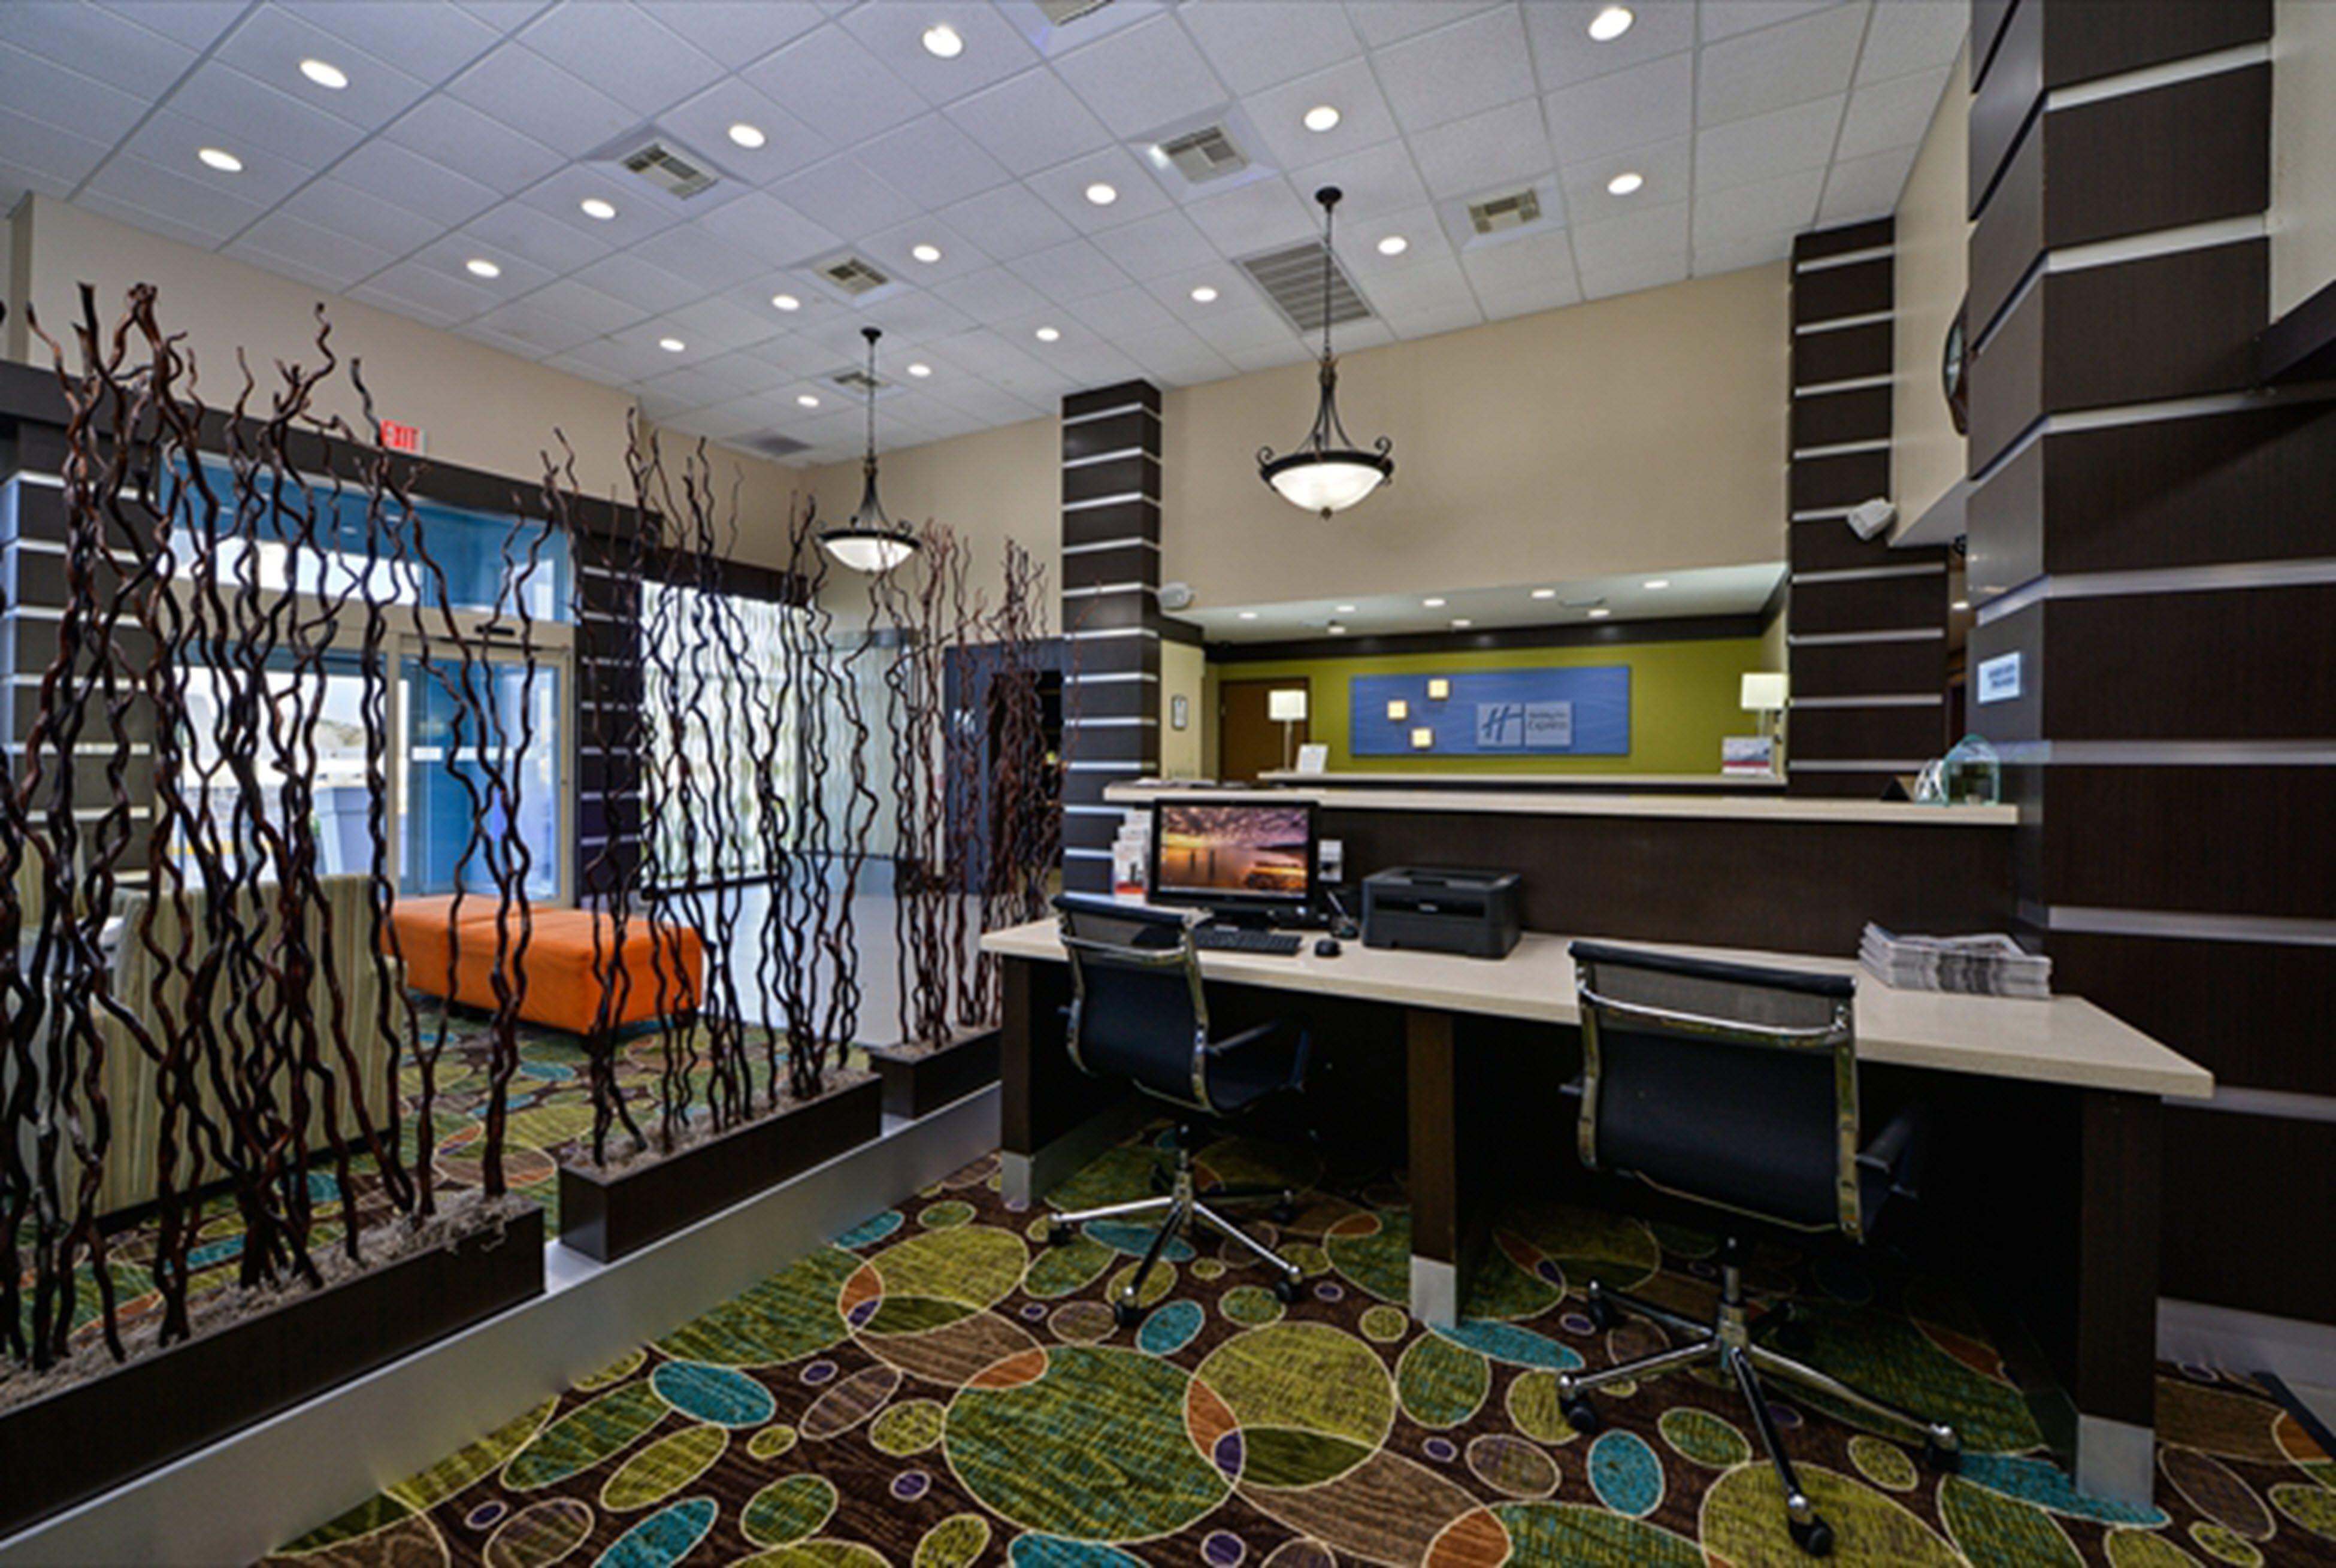 Holiday Inn Express & Suites Kingwood - Medical Center Area image 4